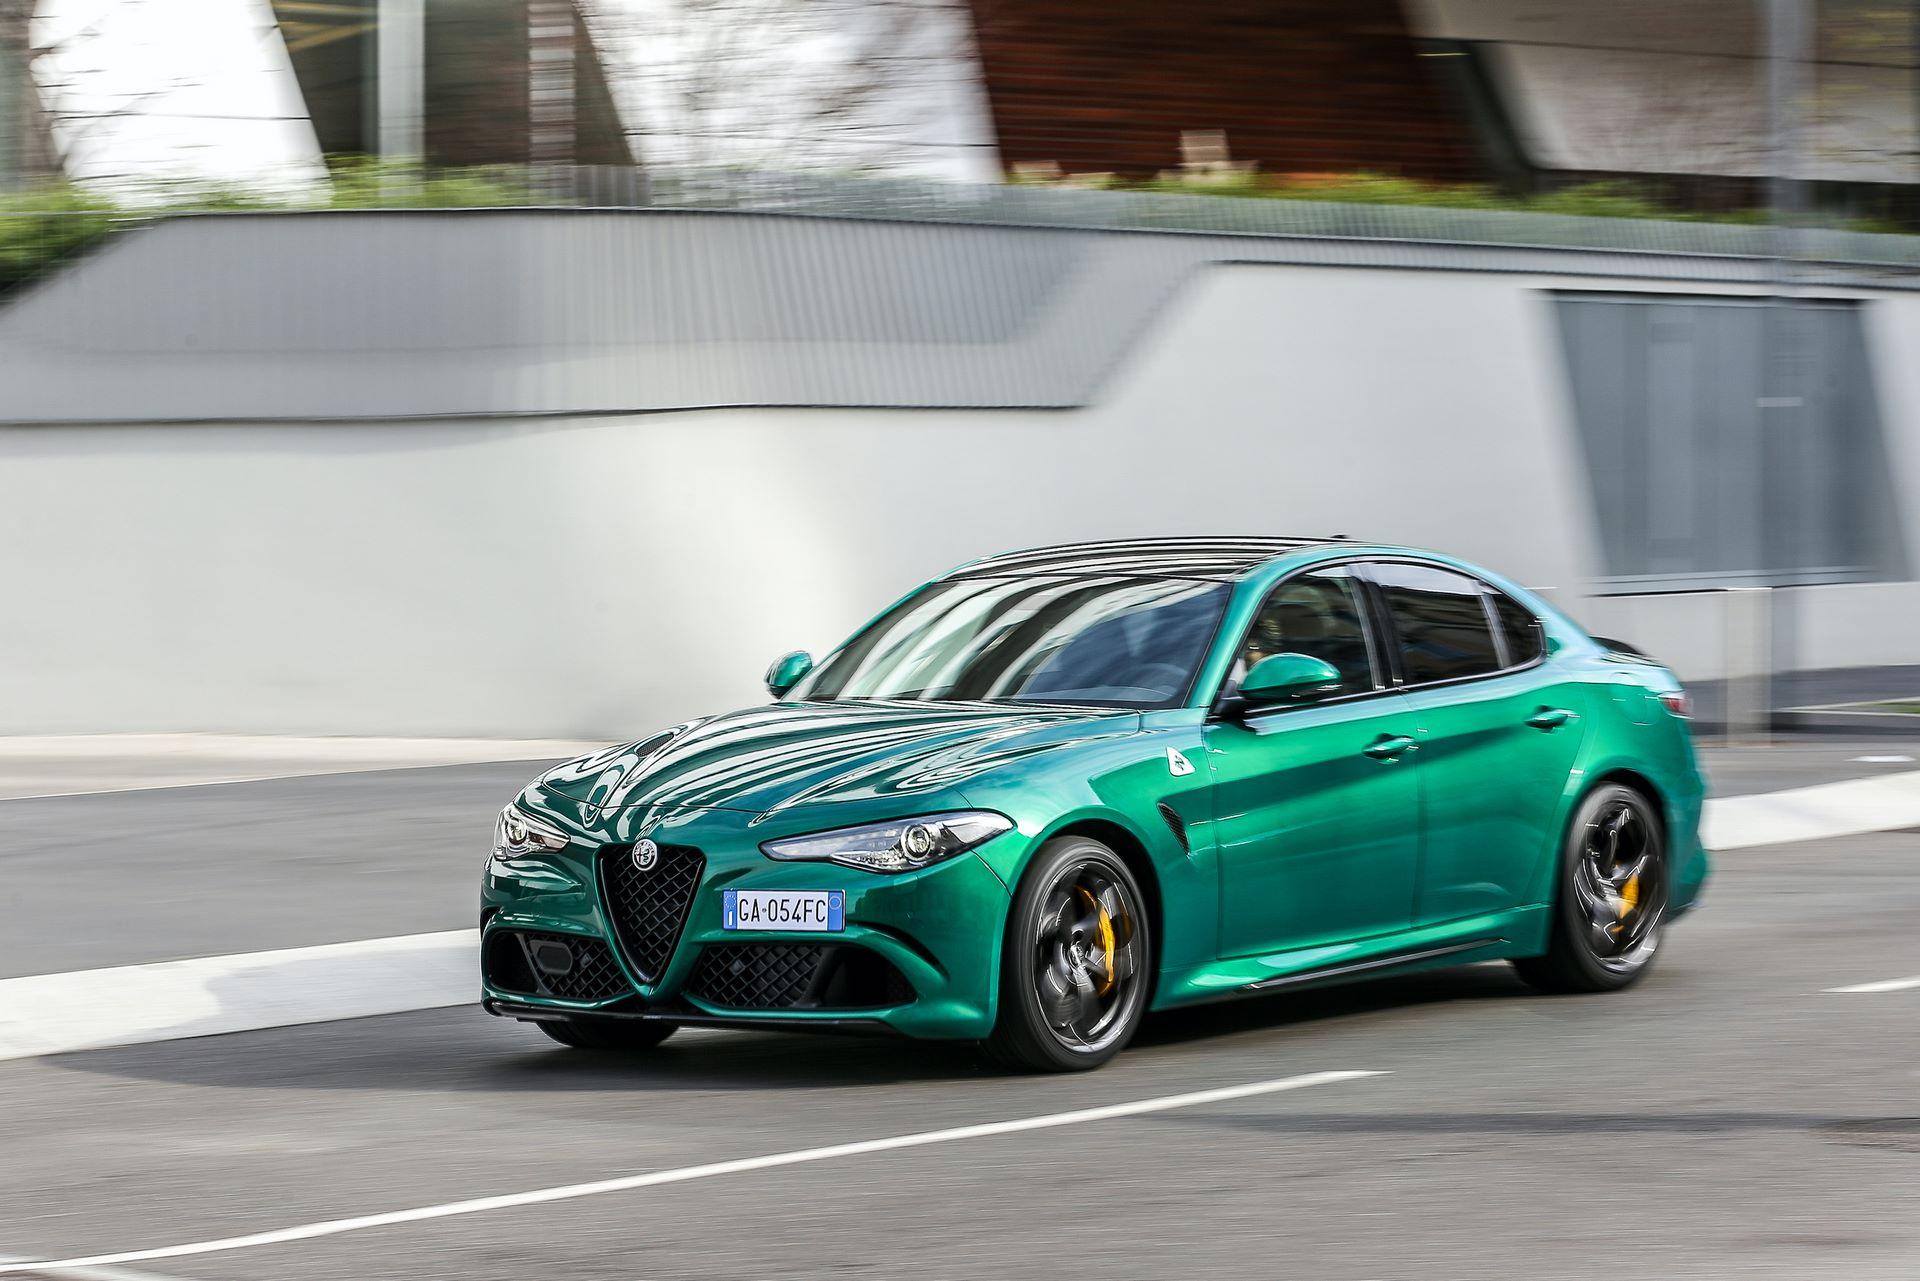 Alfa-Romeo-Giulia-Quadrifoglio-Stelvio-Quadrifoglio-facelift-2020-15